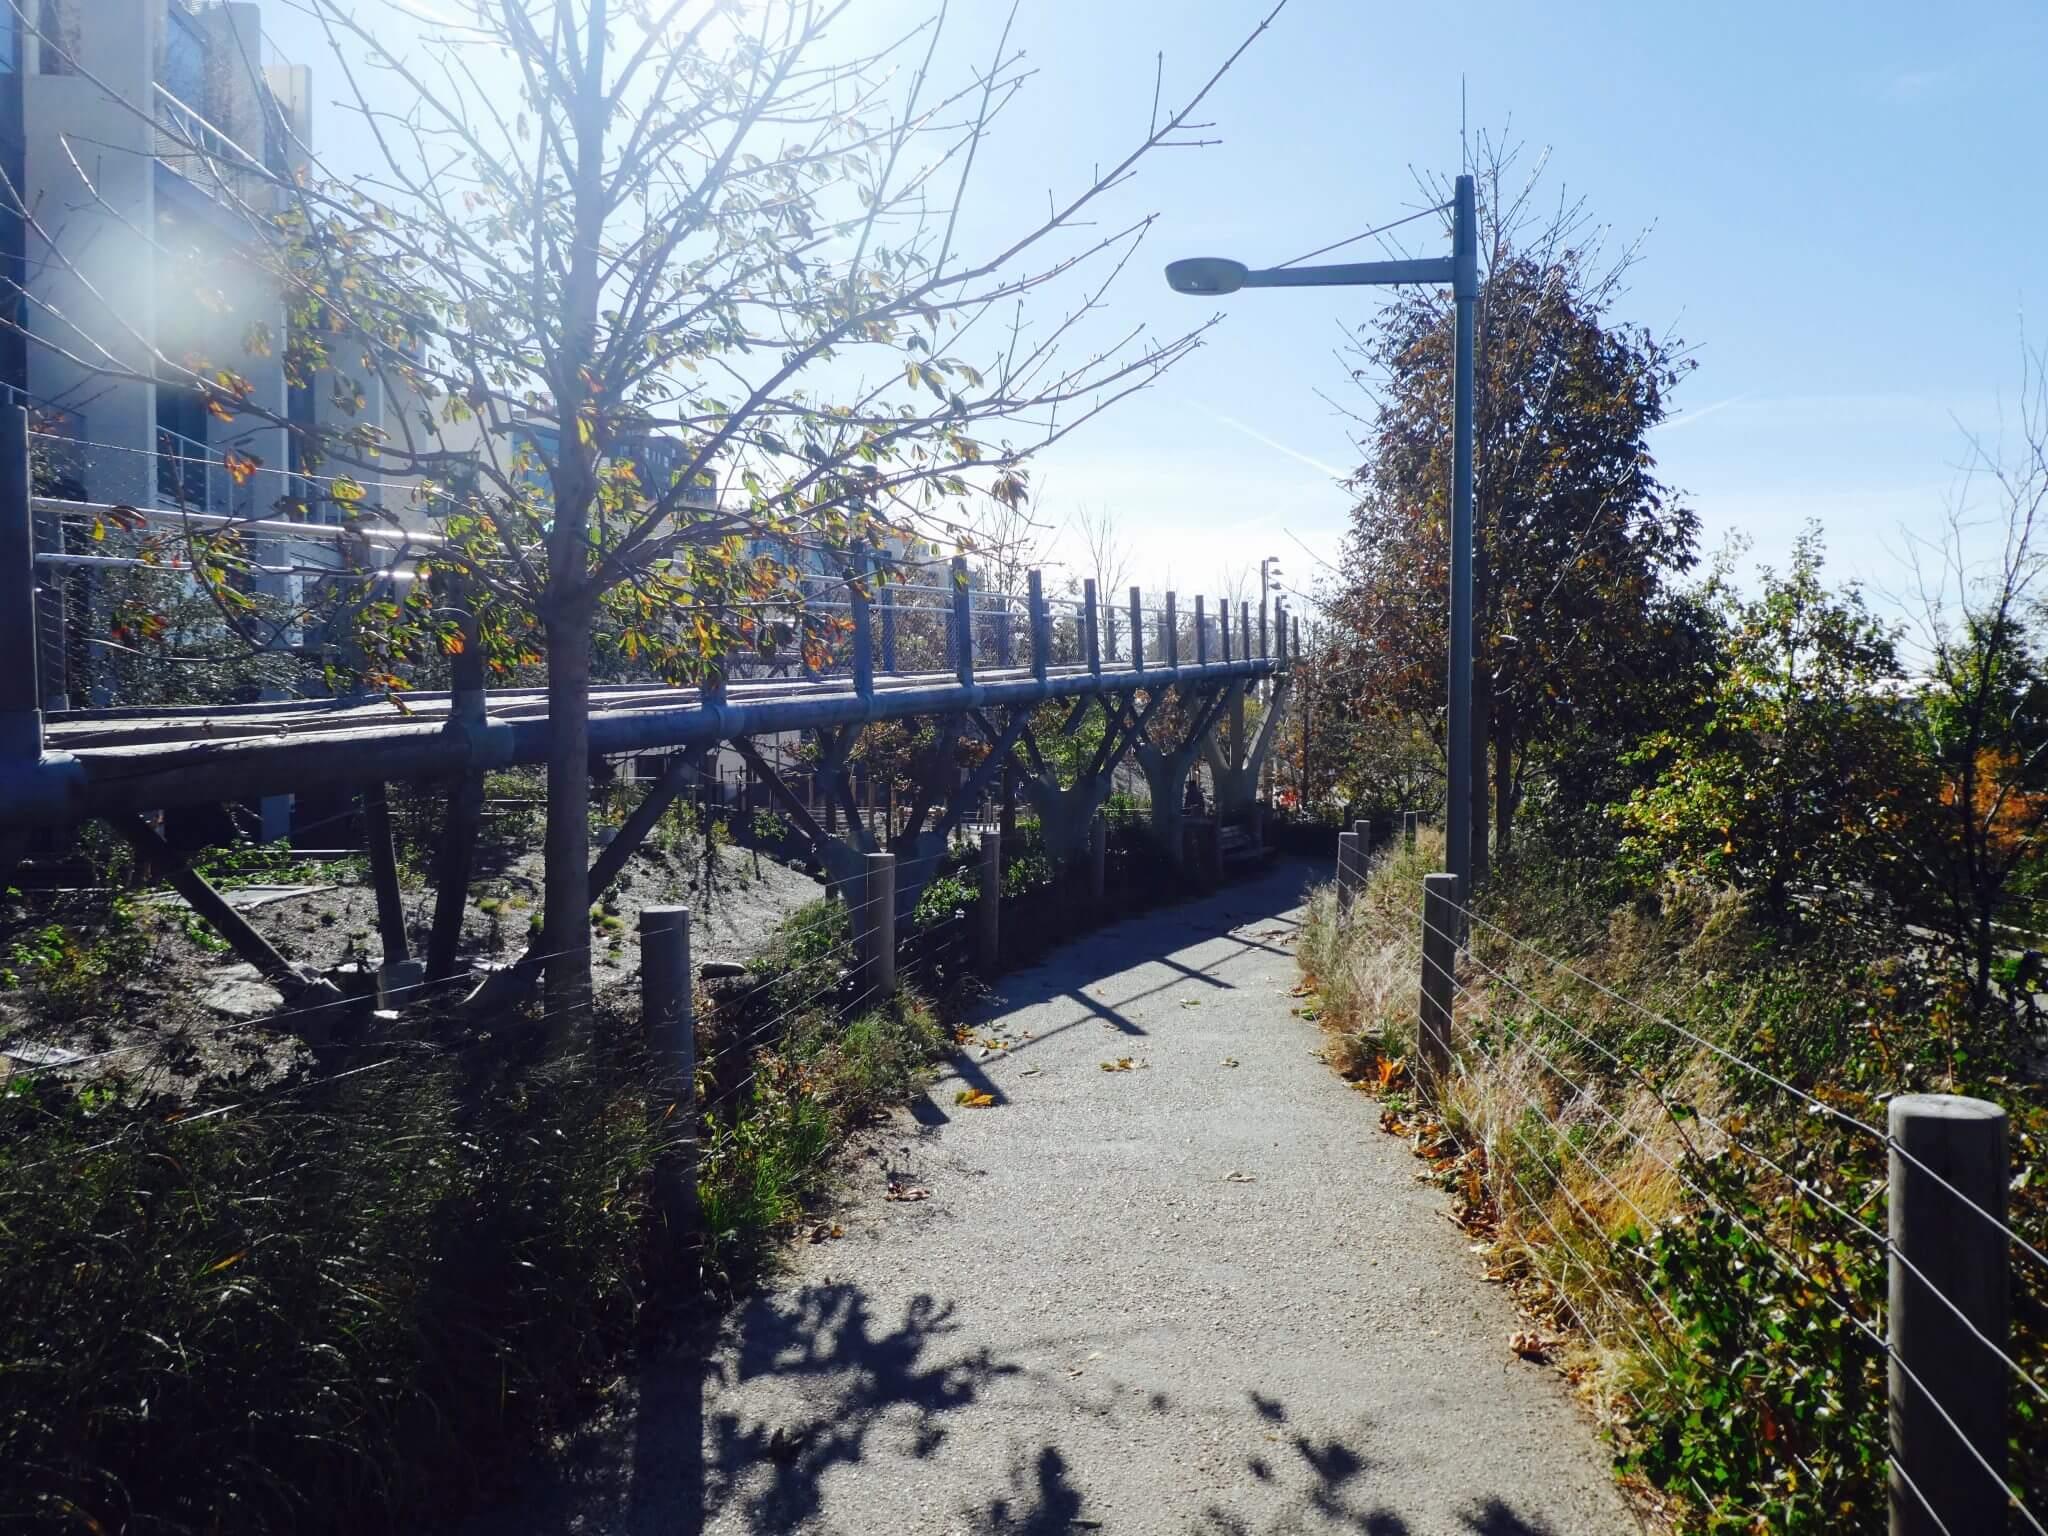 Balade sur brooklyn heights promenade